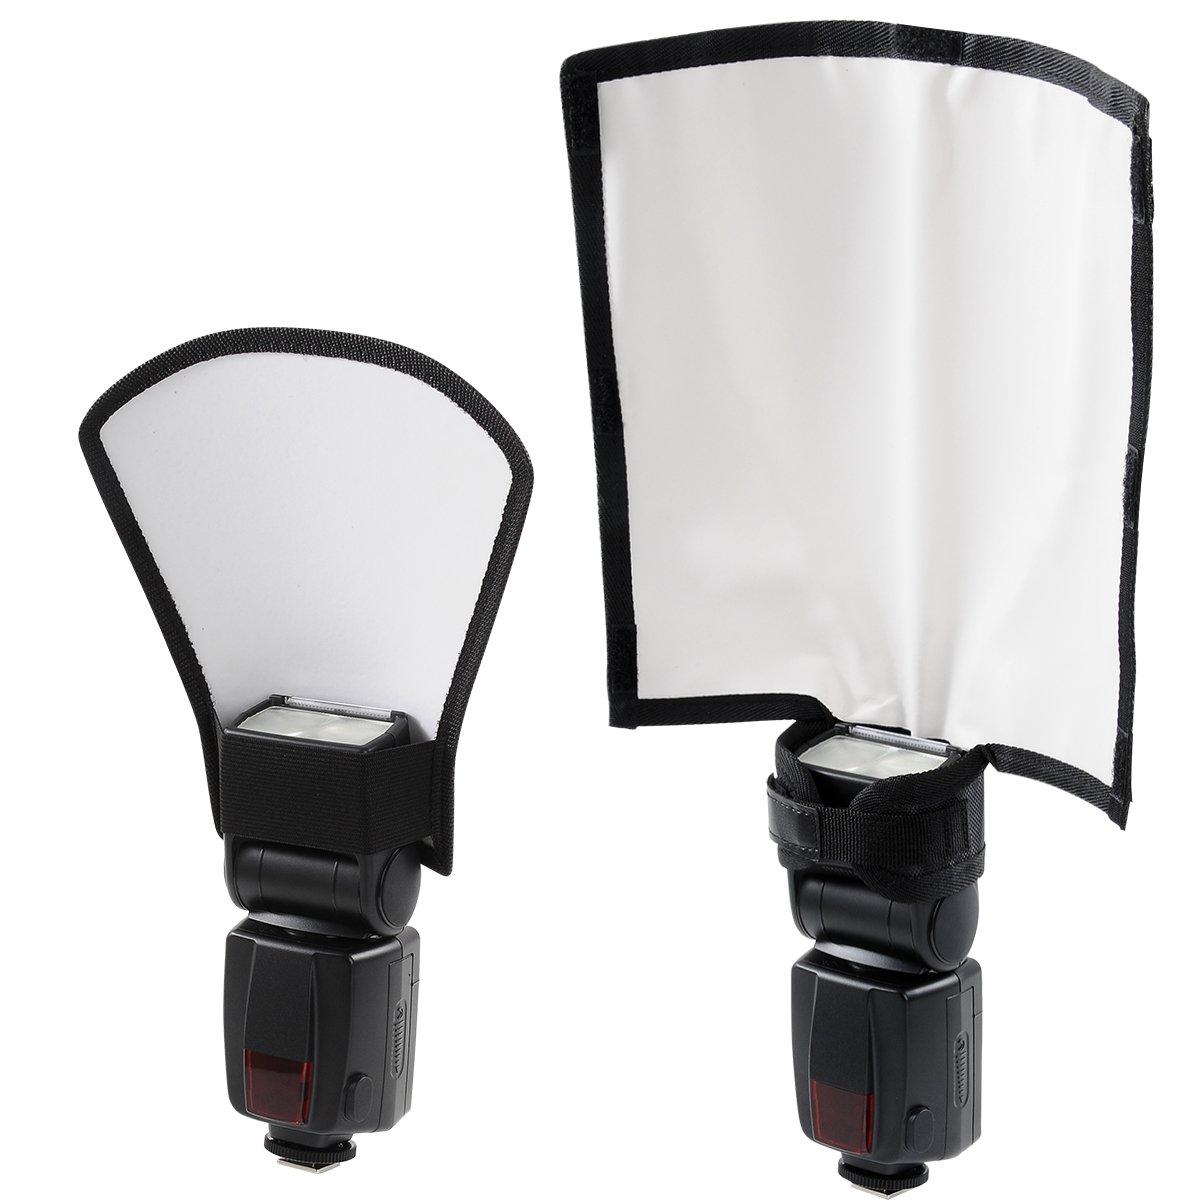 waka Flash Diffuser Reflector Kit - Bend Bounce Flash Diffuser+ Silver/White Reflector for Speedlight, Universal Mount for Canon, Nikon, etc. by waka